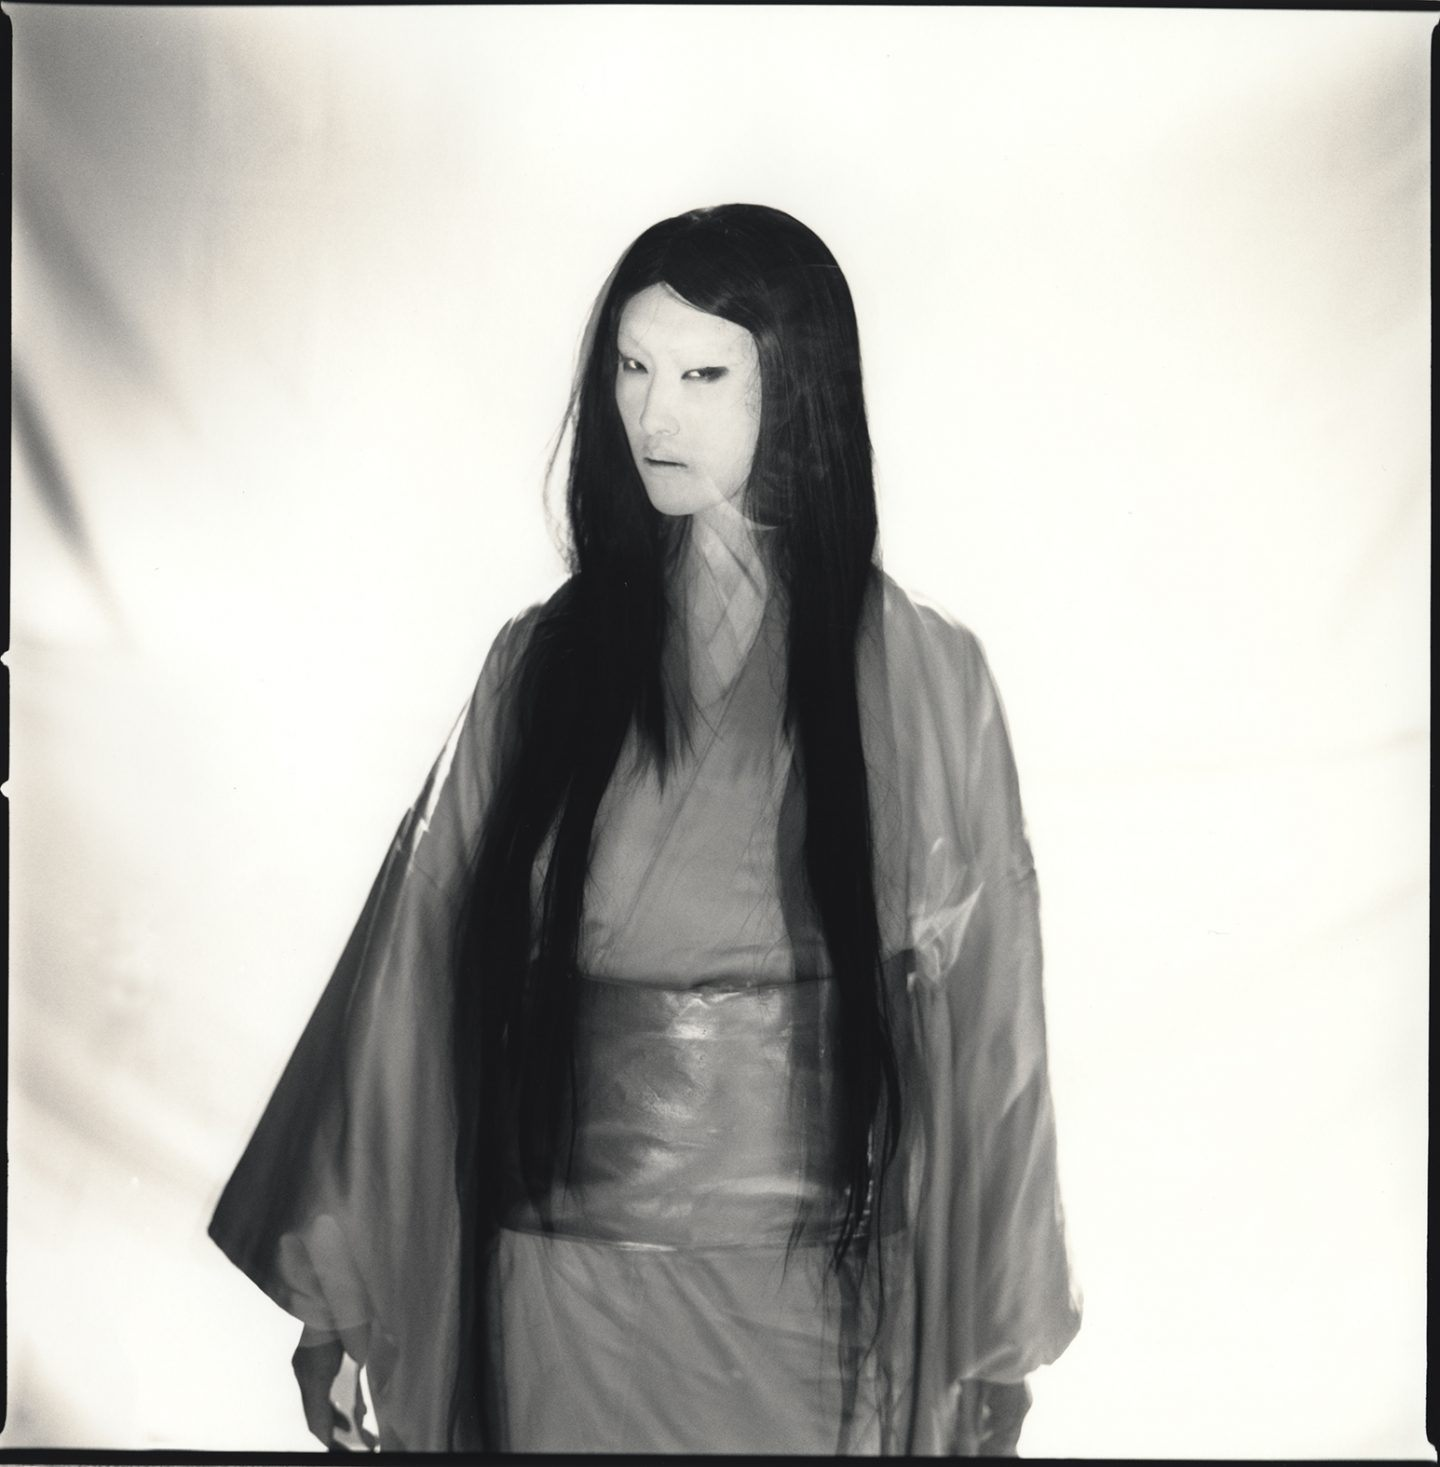 IGNANT-Photography-Hiroshi-Watanabe-Kwaidan-017